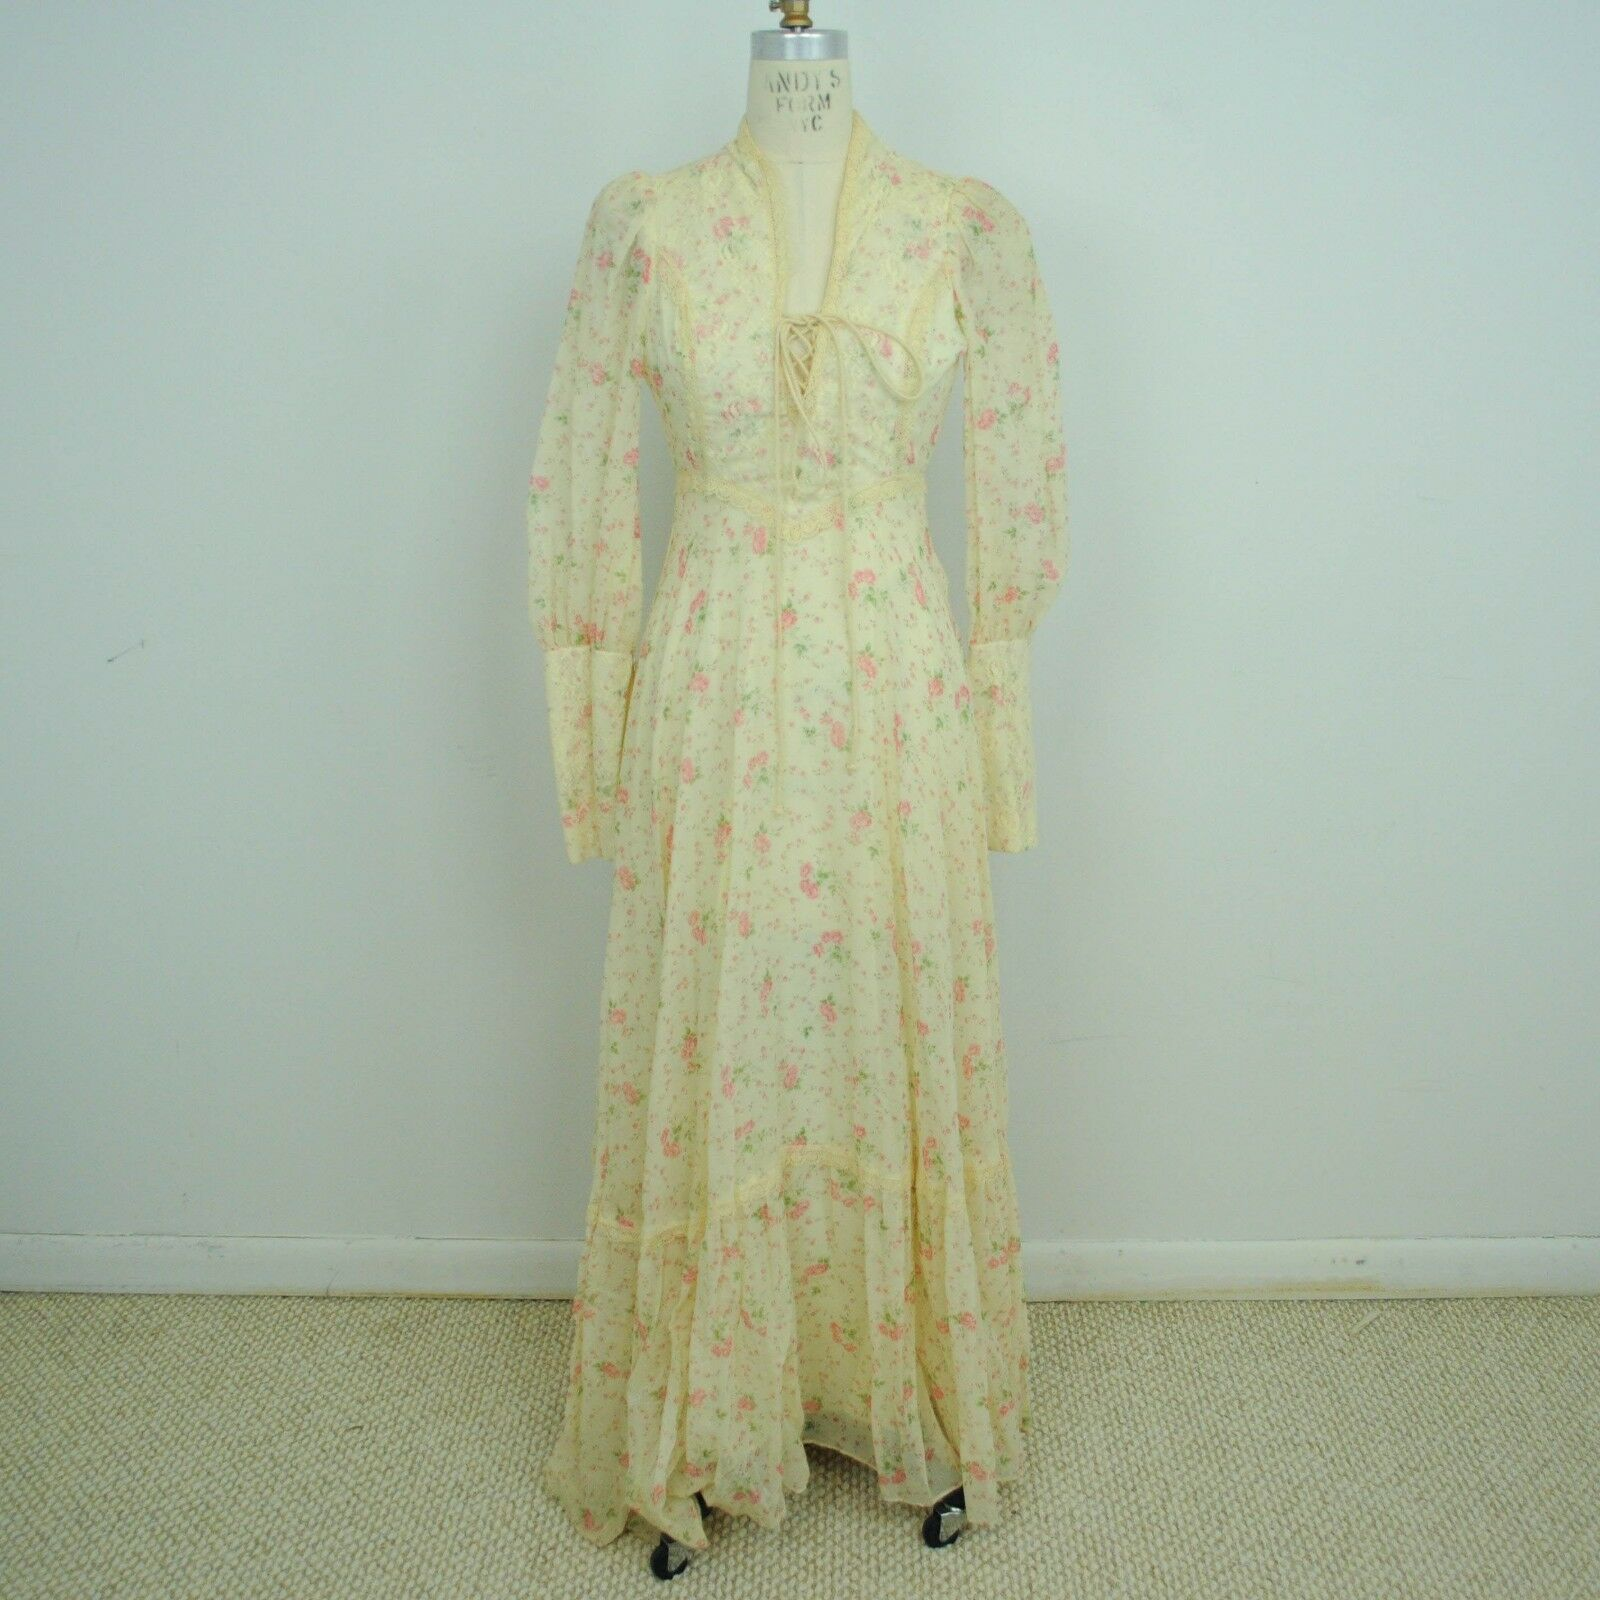 VTG 60s Womens Prairie Victorian Maxi Dress XXS XS Floral Lace Up Ivory J21